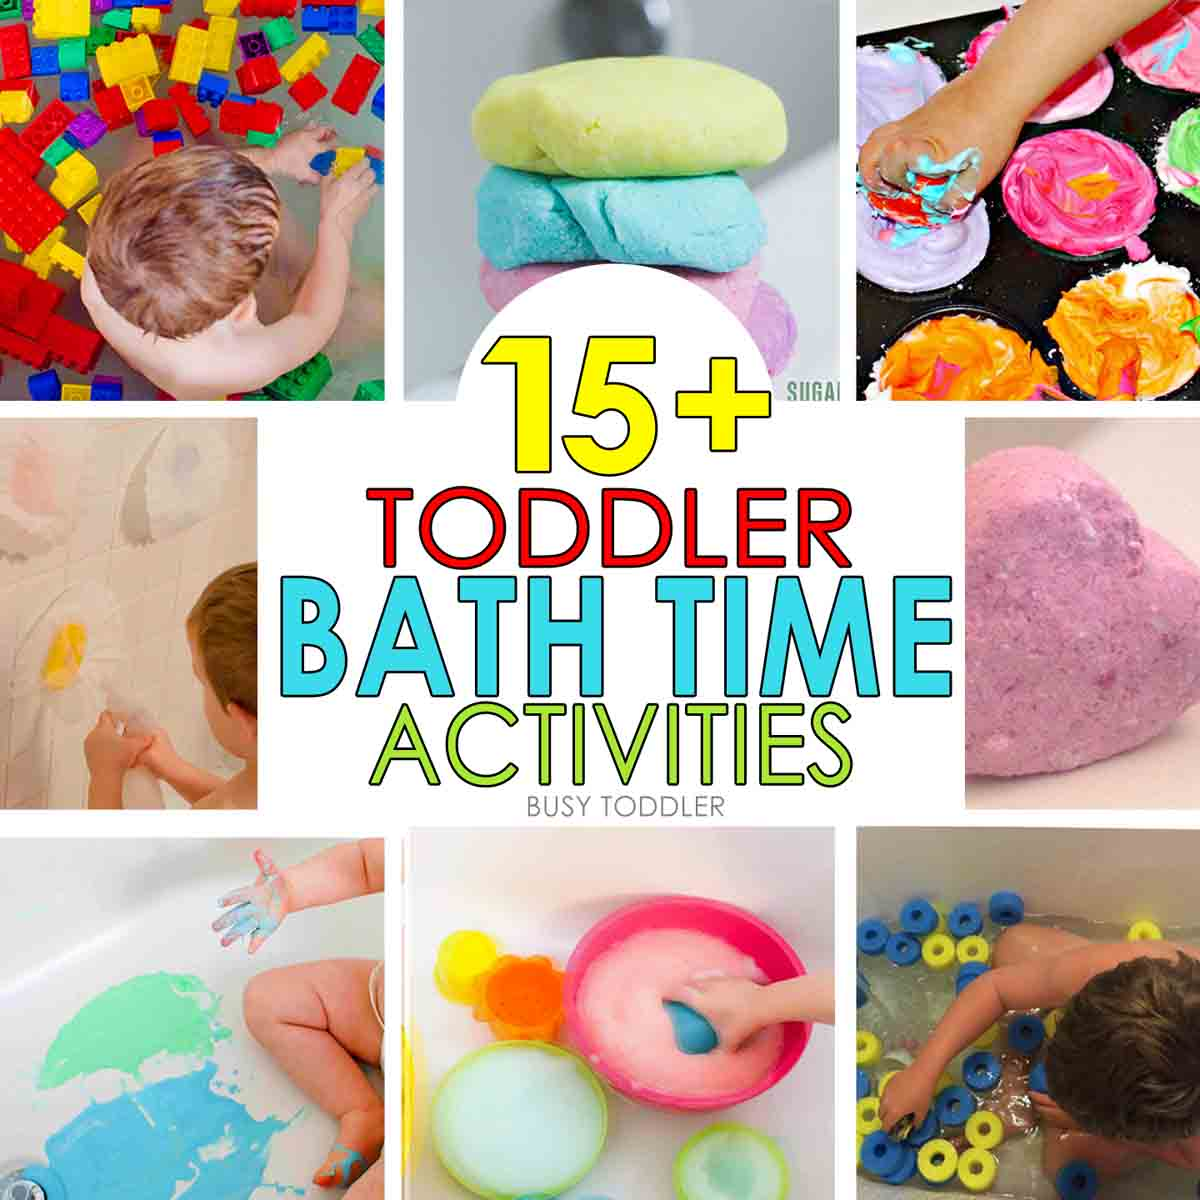 15+ Toddler Bath Time Activities